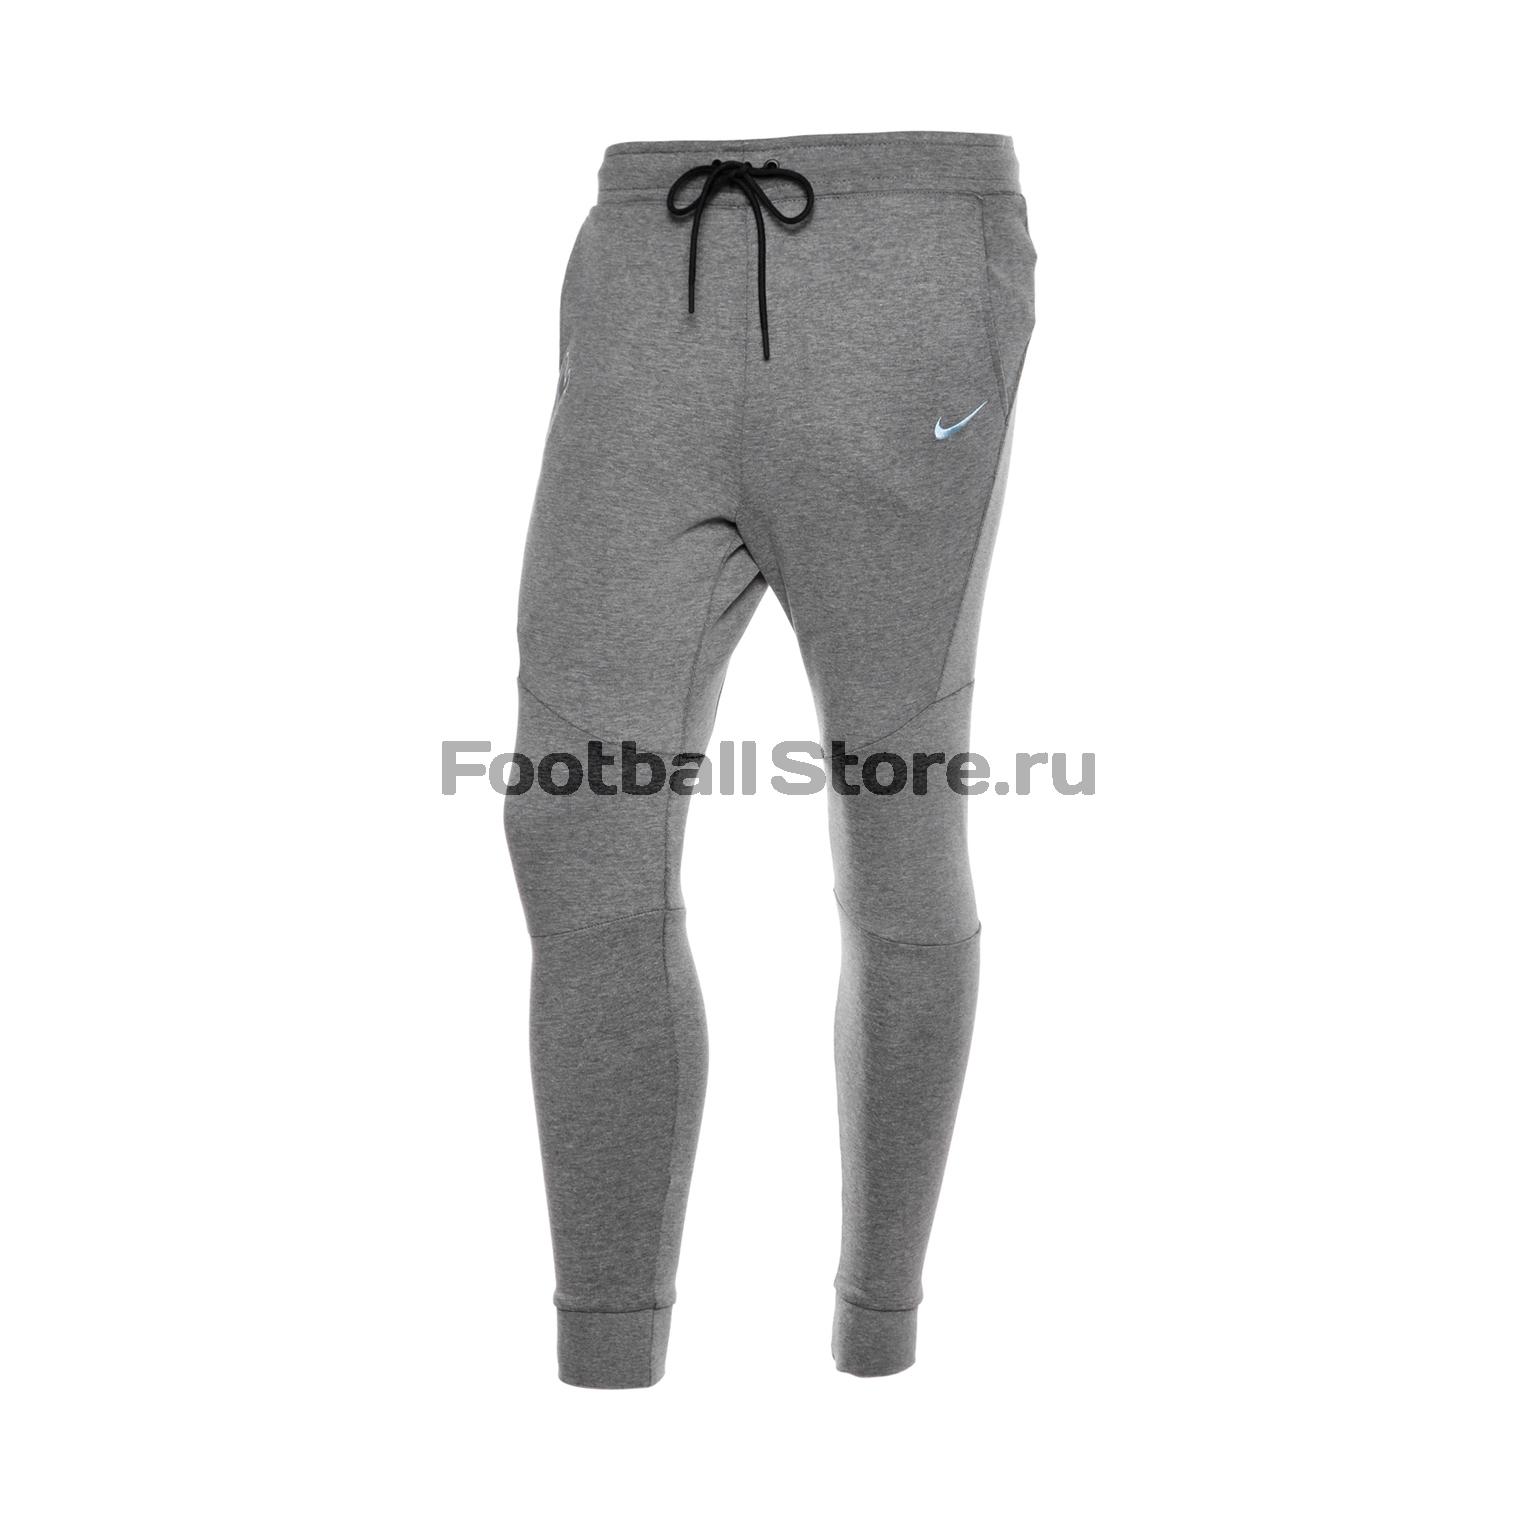 Брюки Nike Tottenham Hotspur Fleece AA1939-095 tottenham brighton